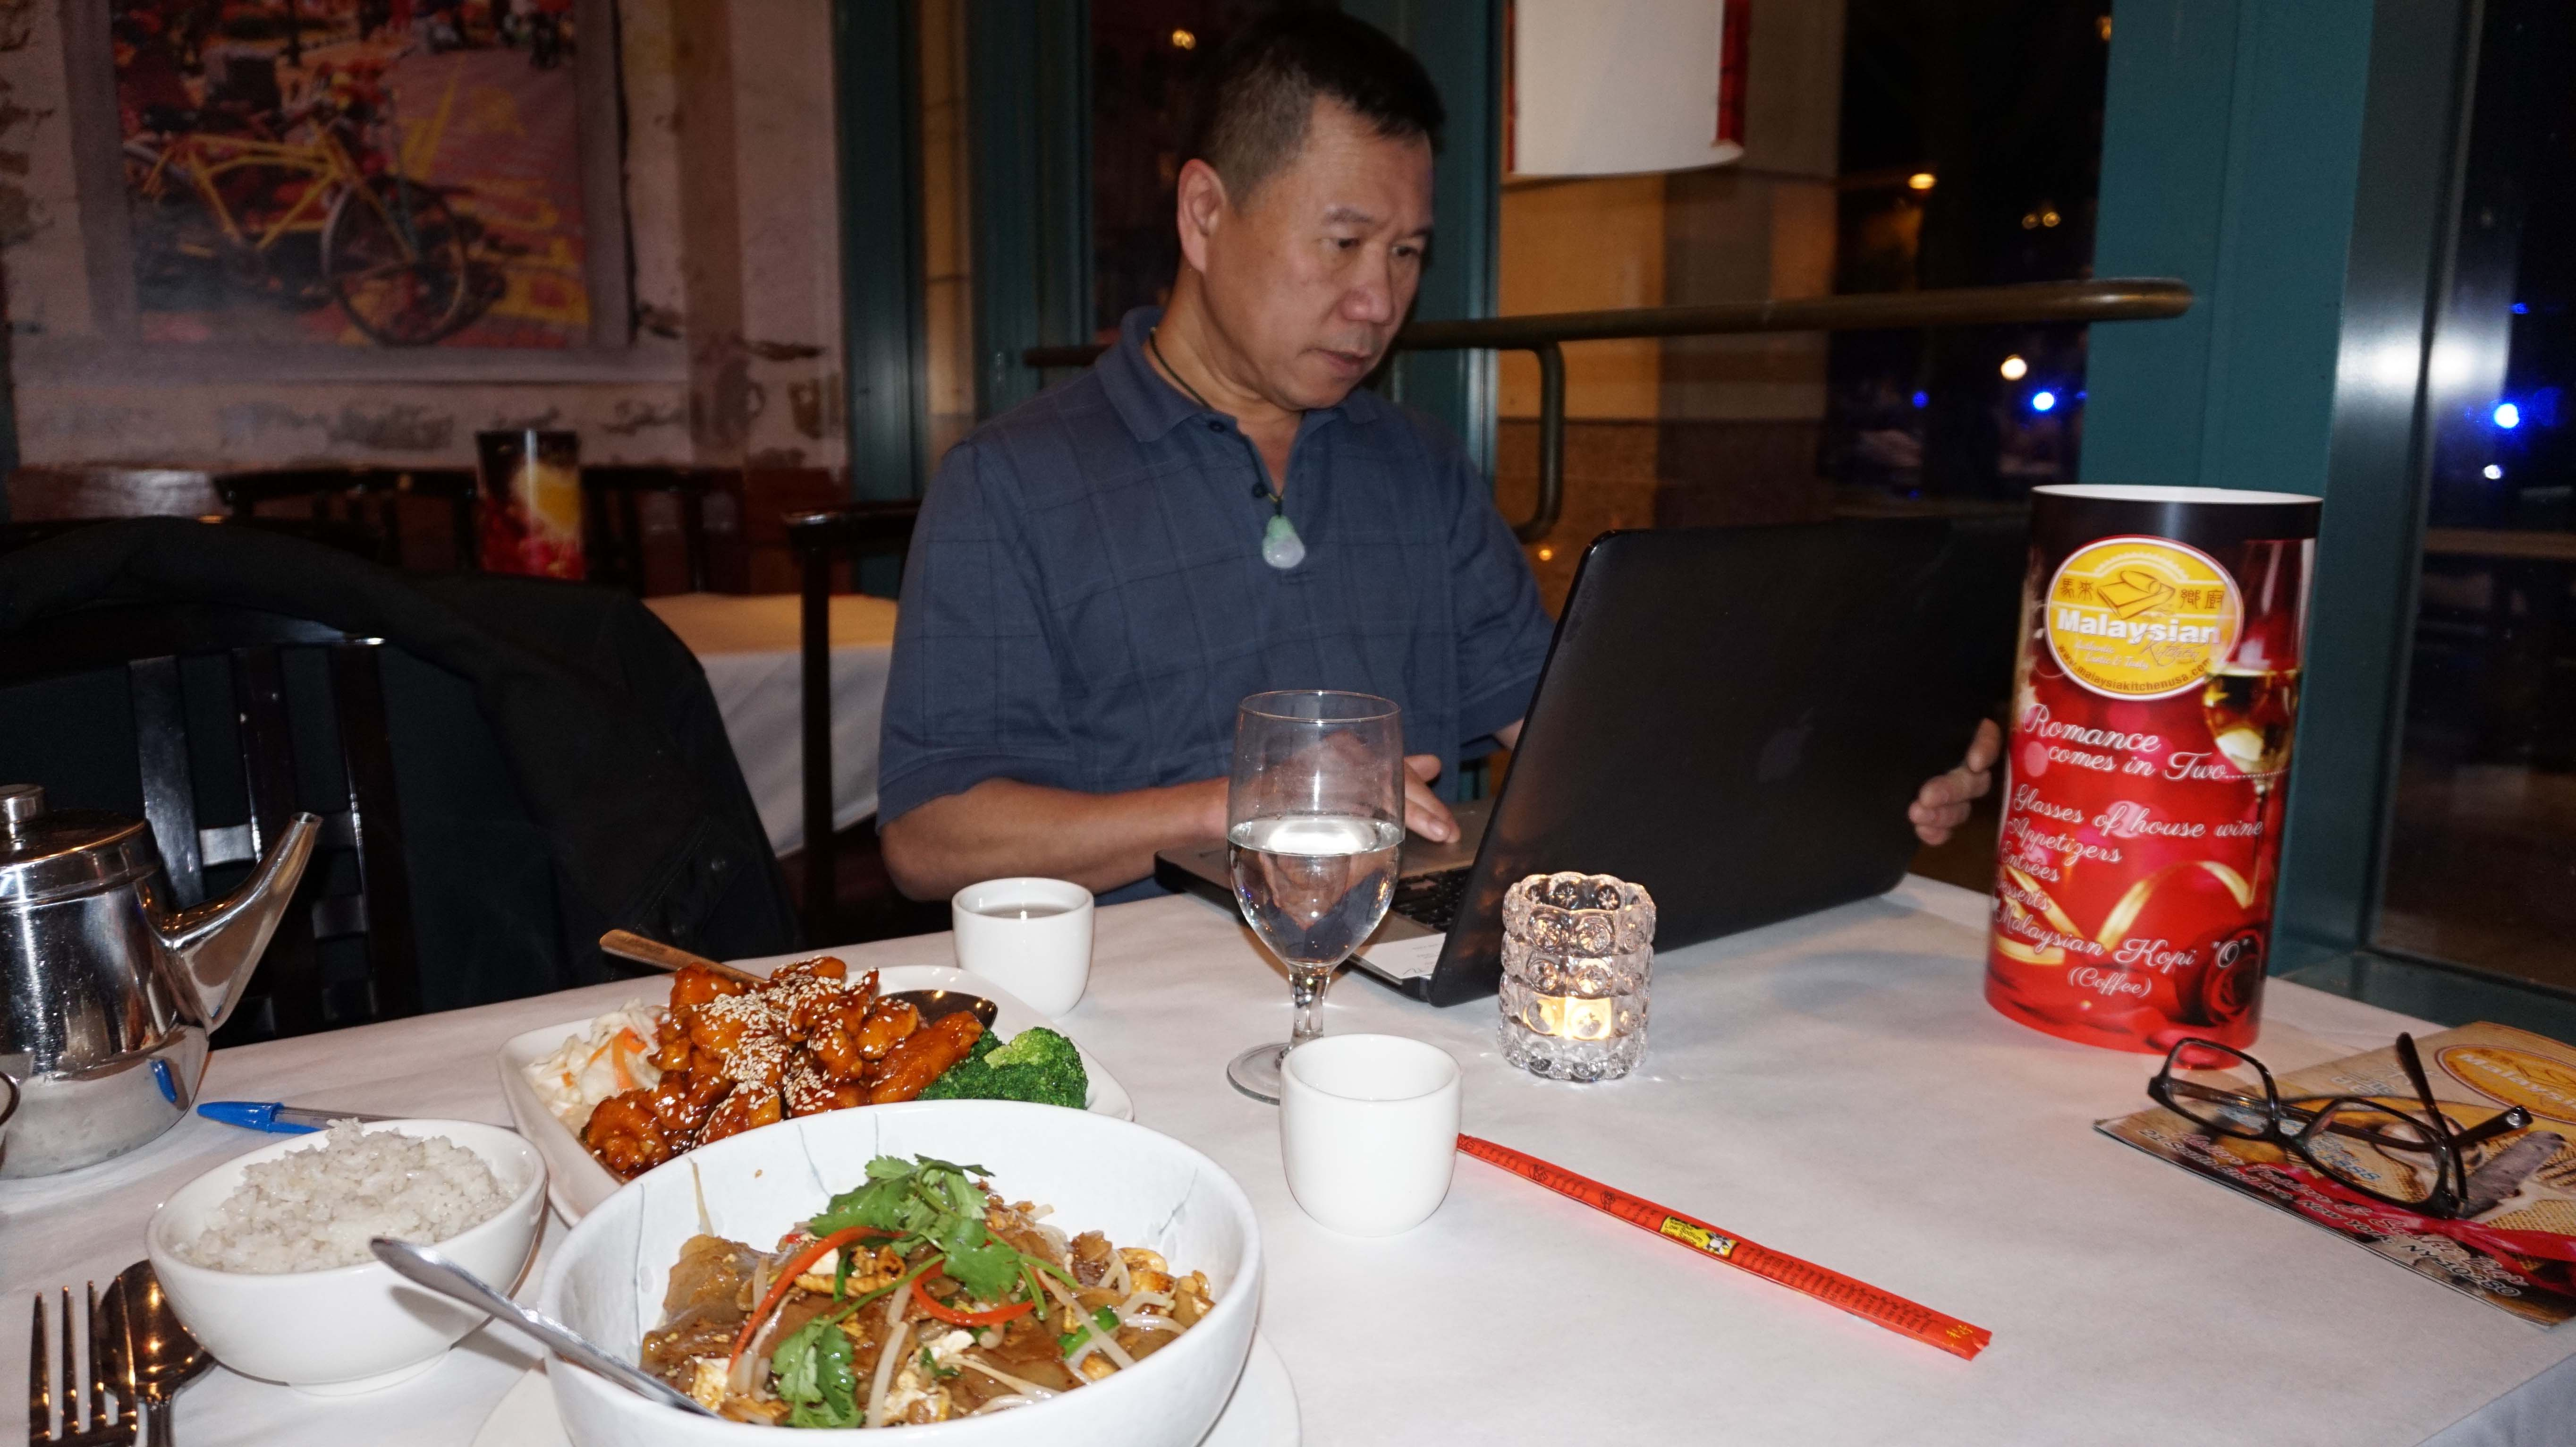 Malaysian Kitchen owner Kirby Tan